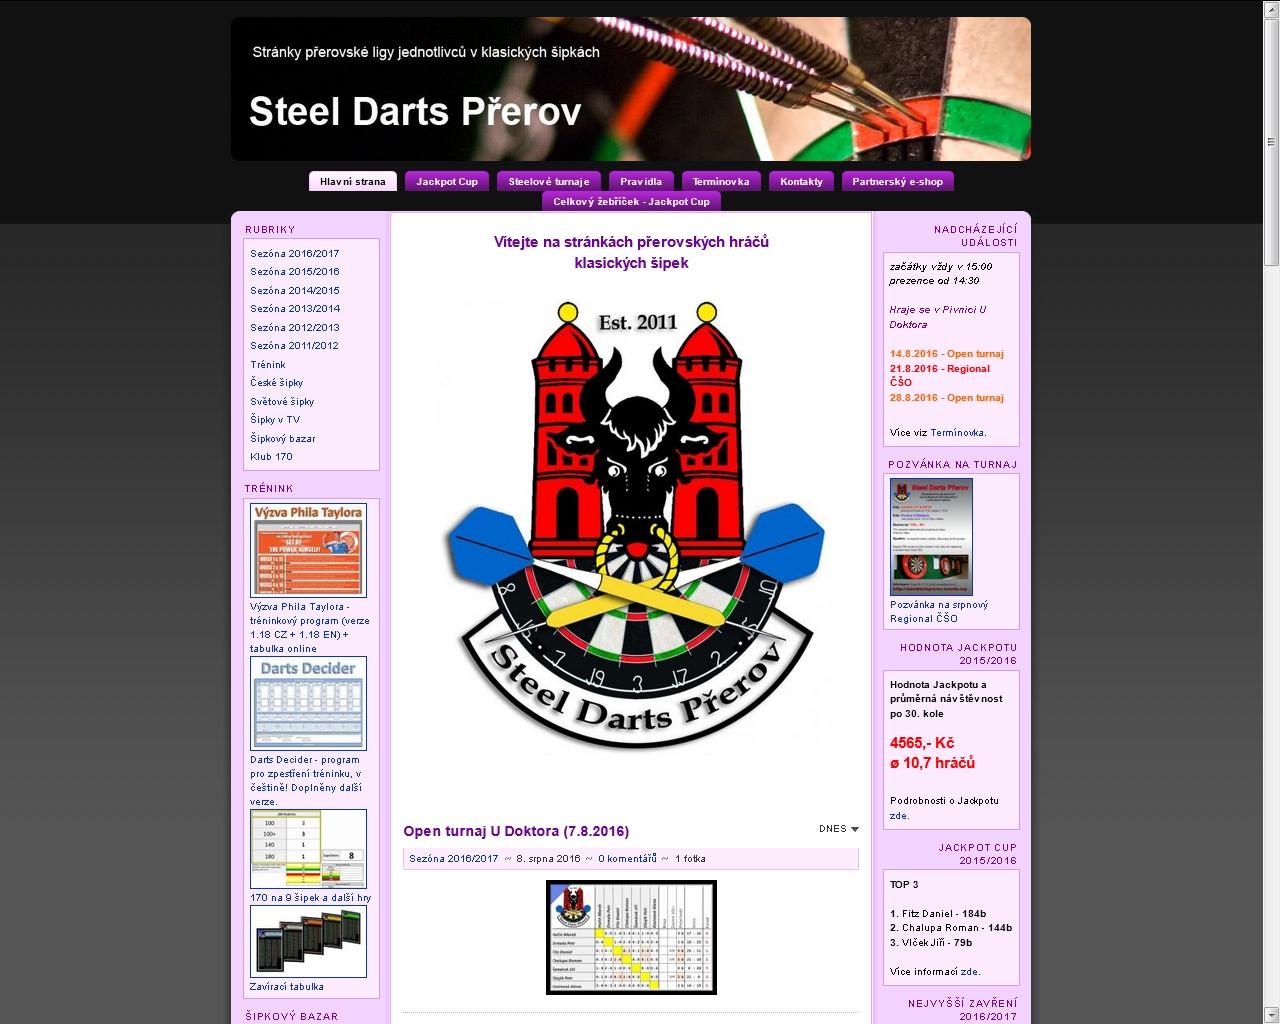 steeldartsprerov-czweb-org_layout_001